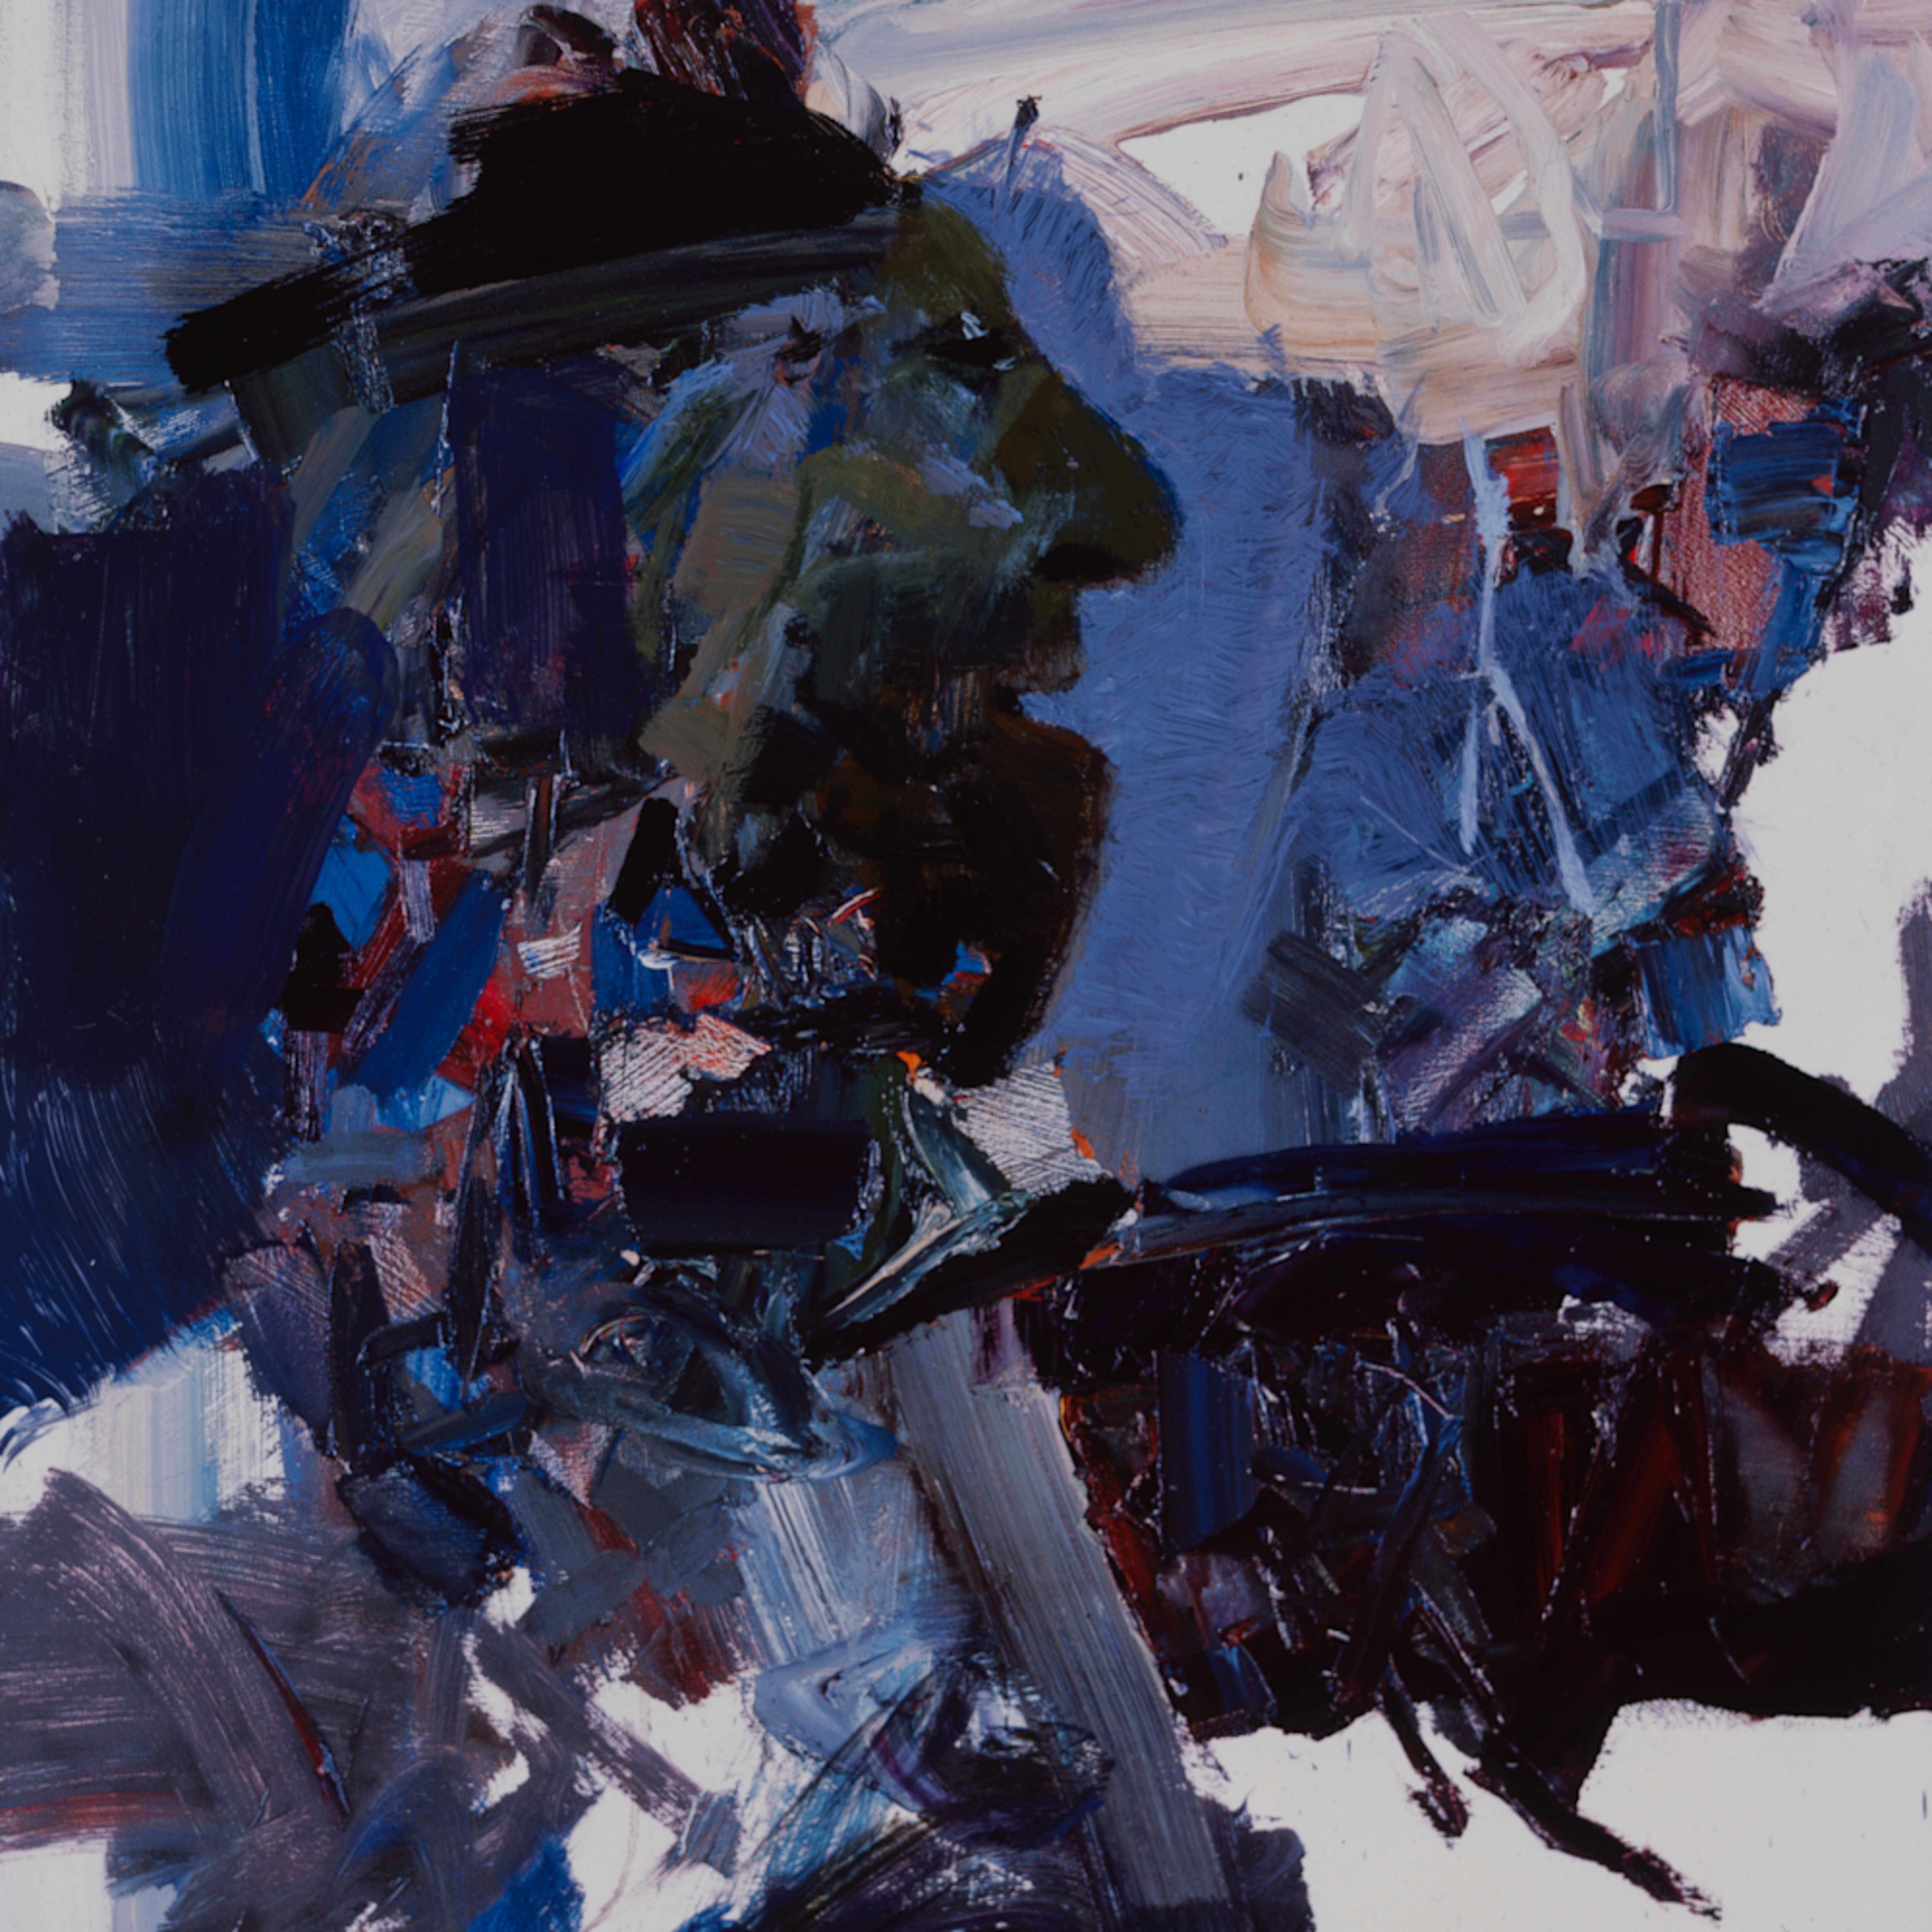 Fotor.indian head abstract k9vwar